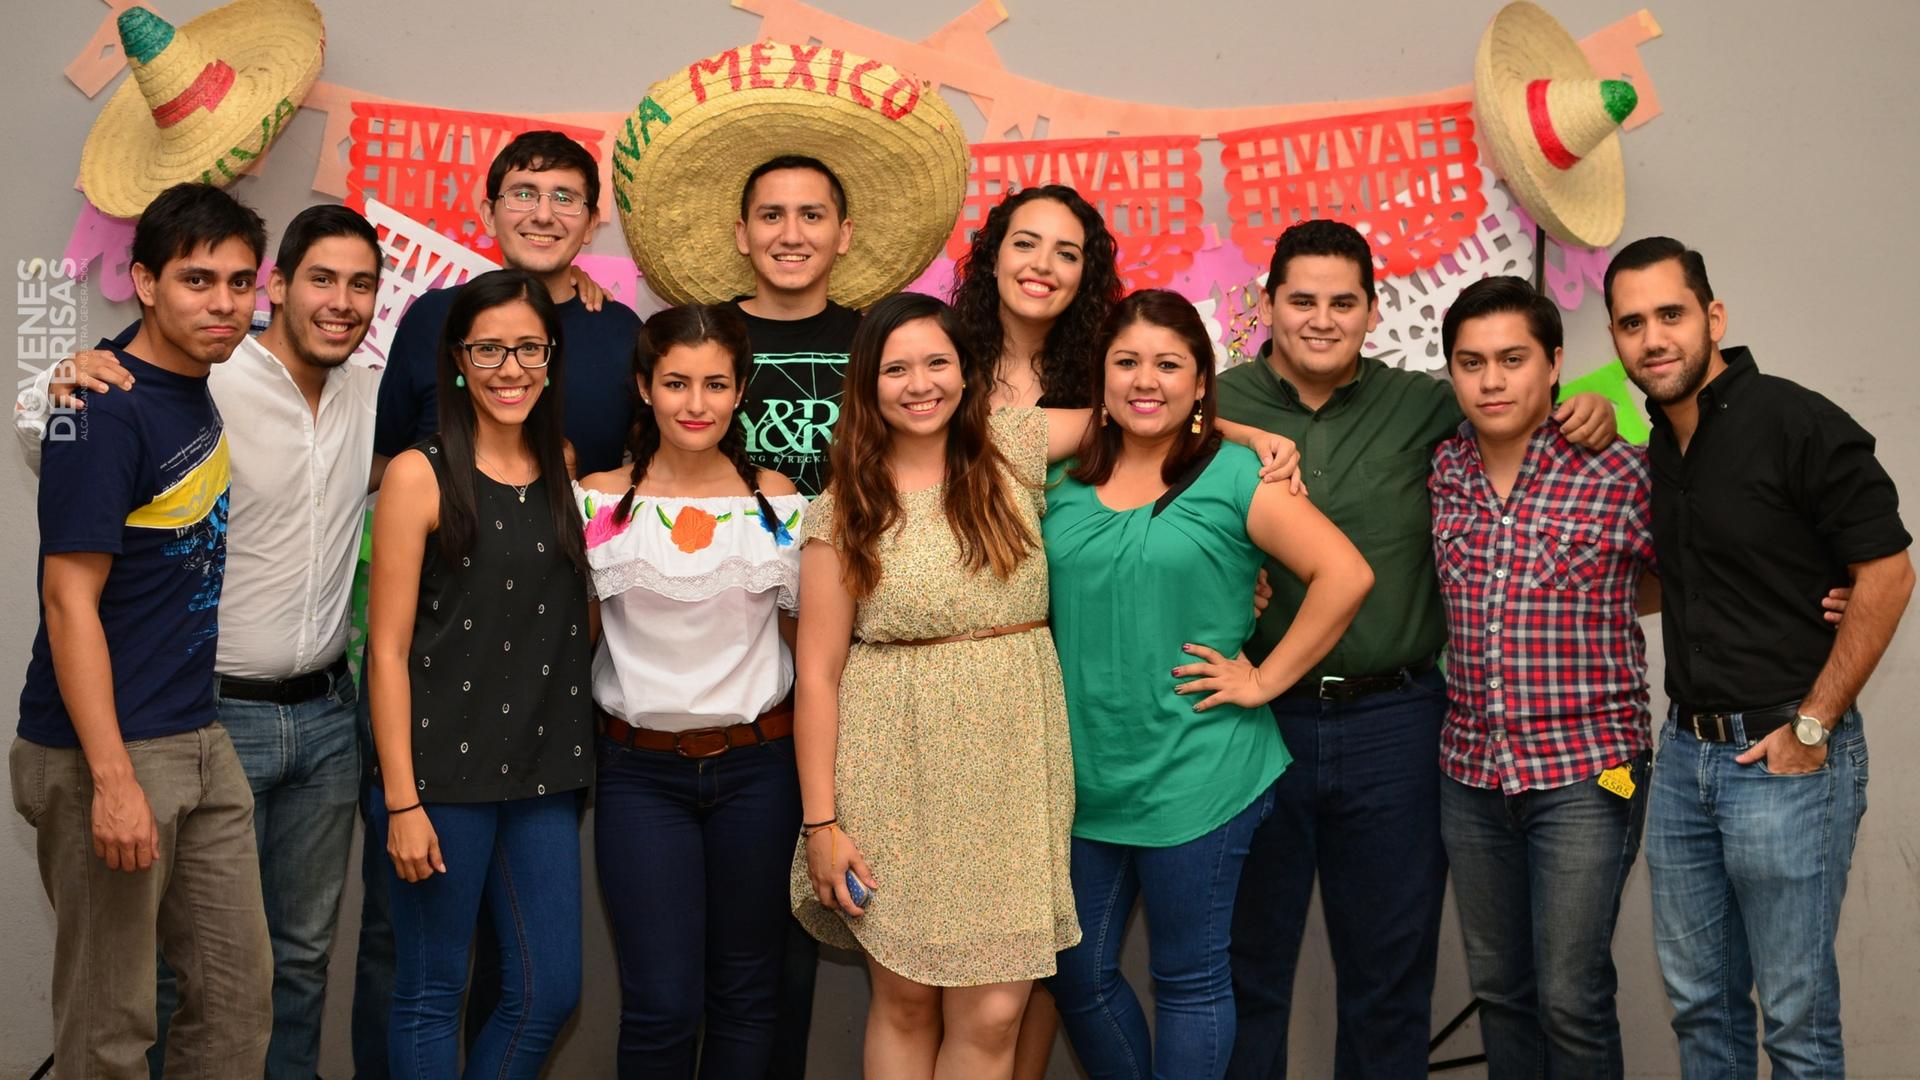 Súper Fiesta Mexicana